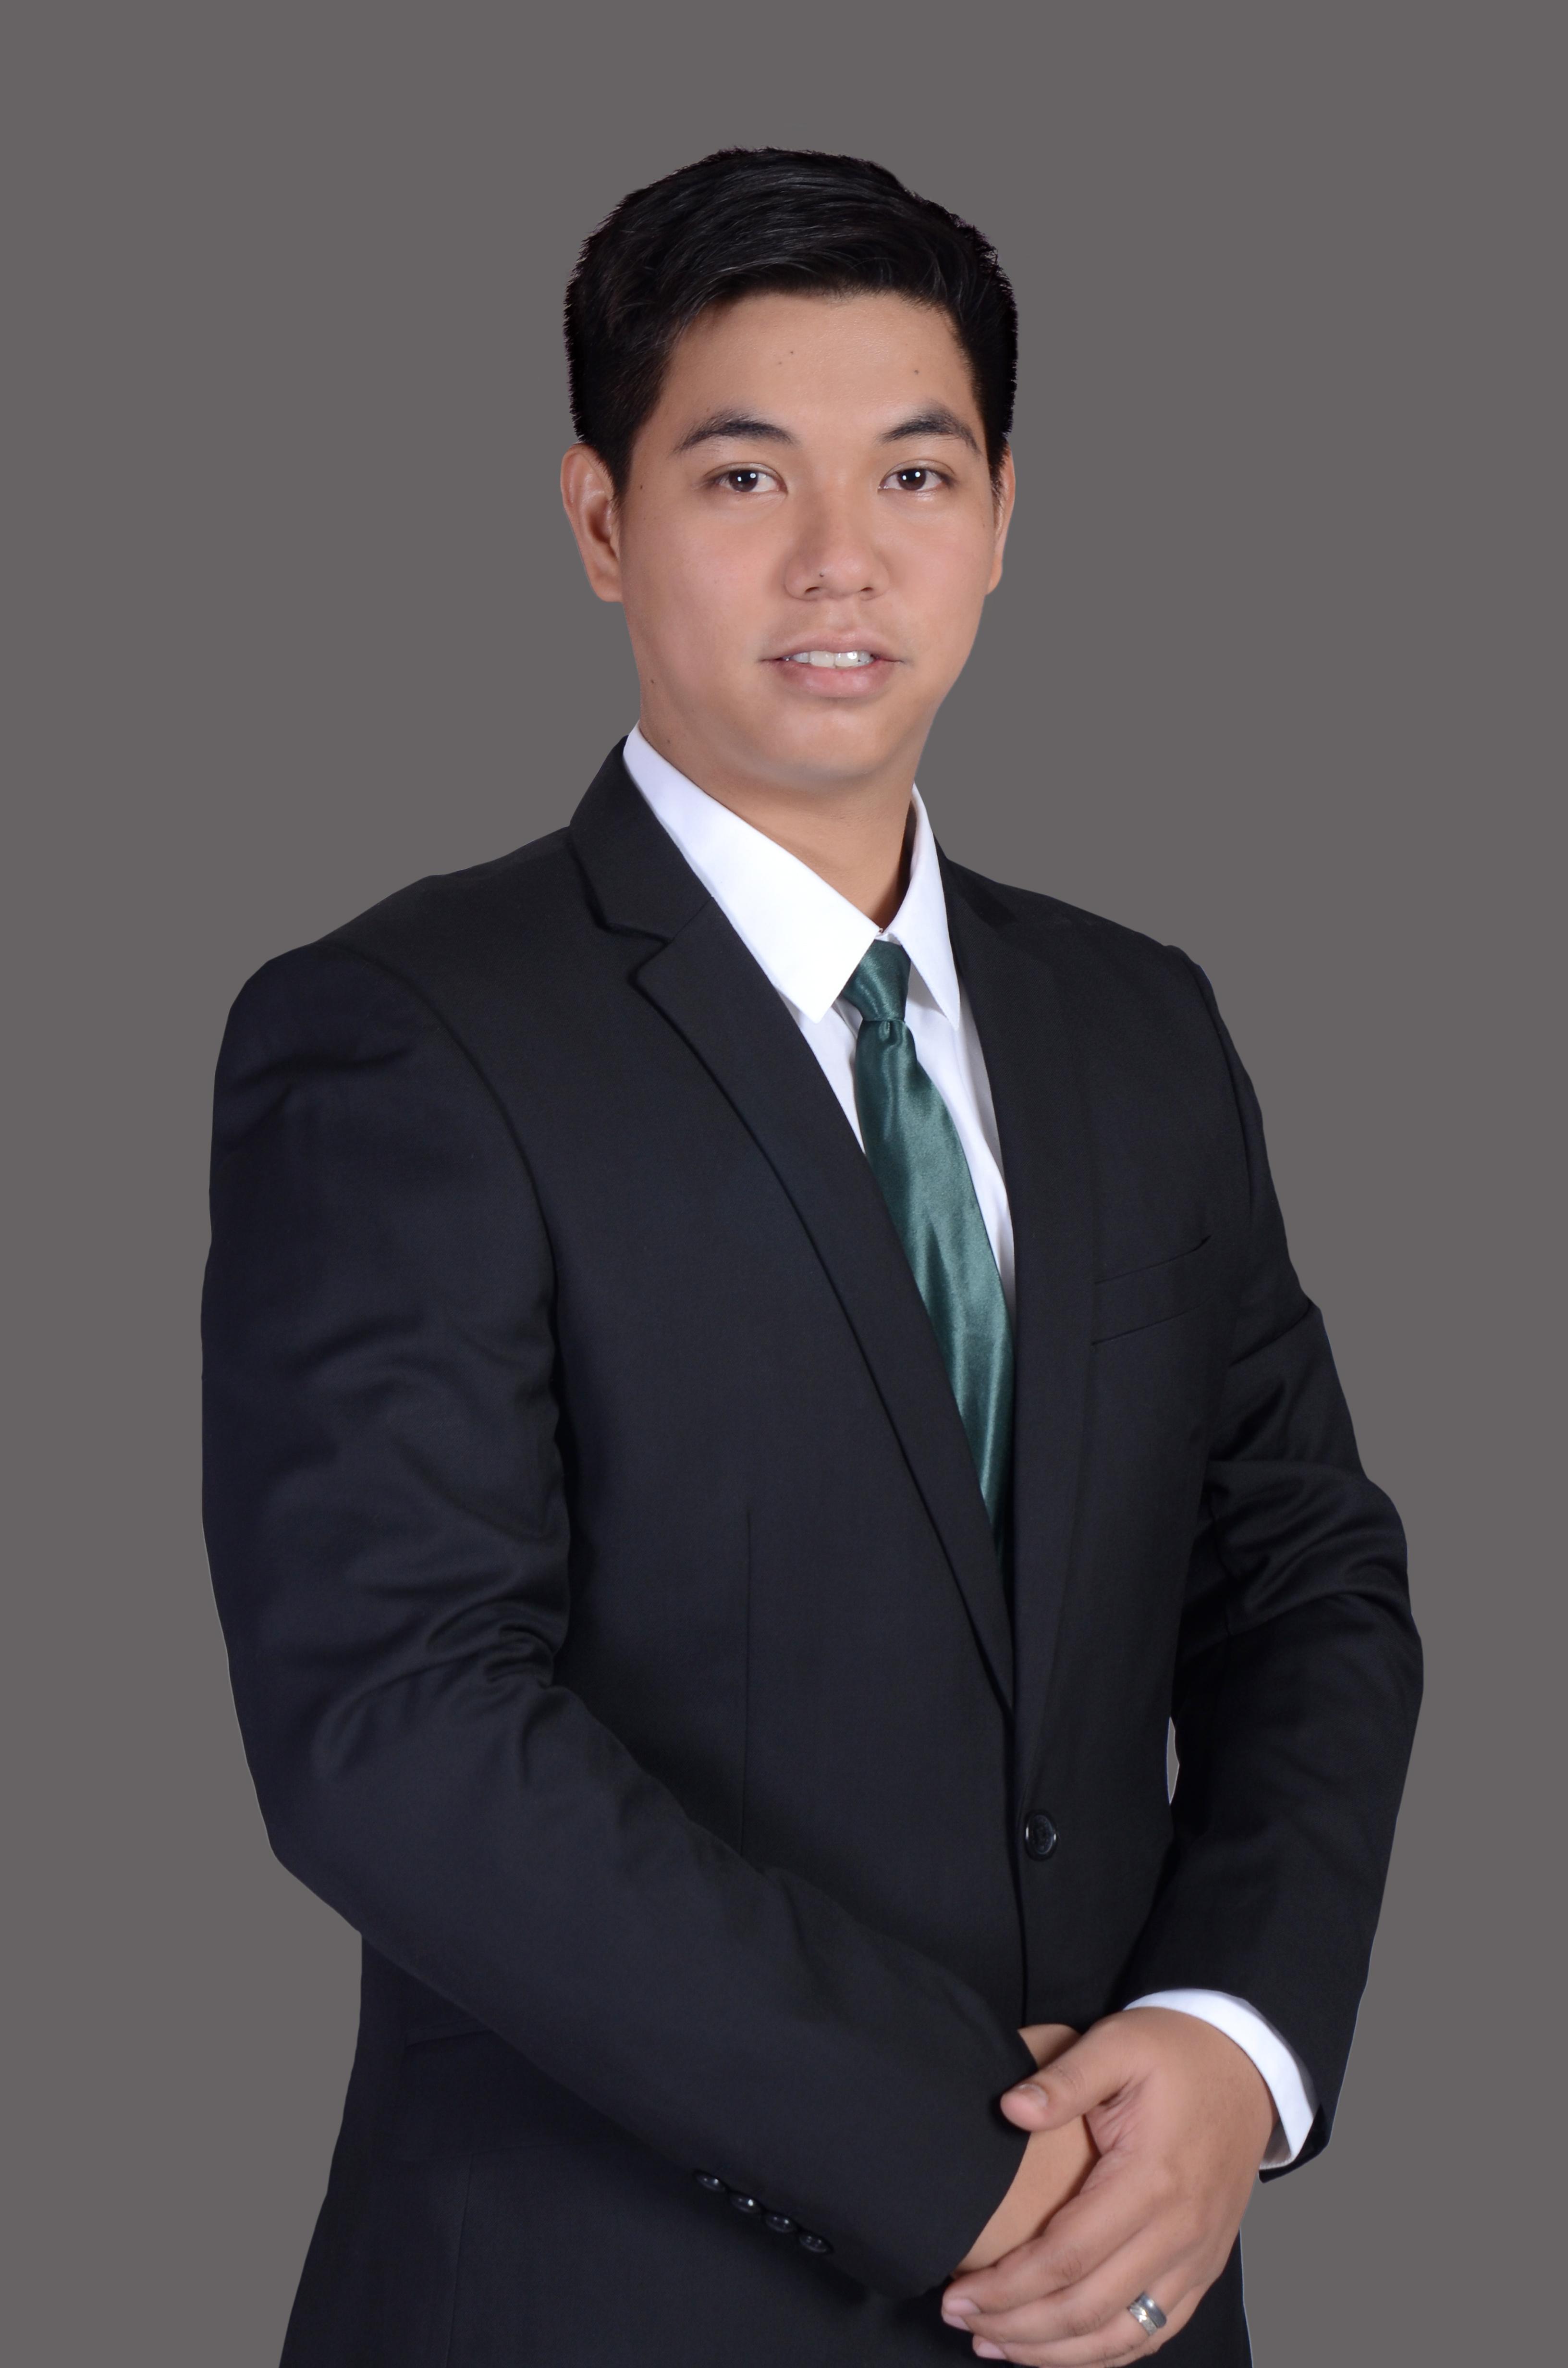 Jose A. Lim Vi